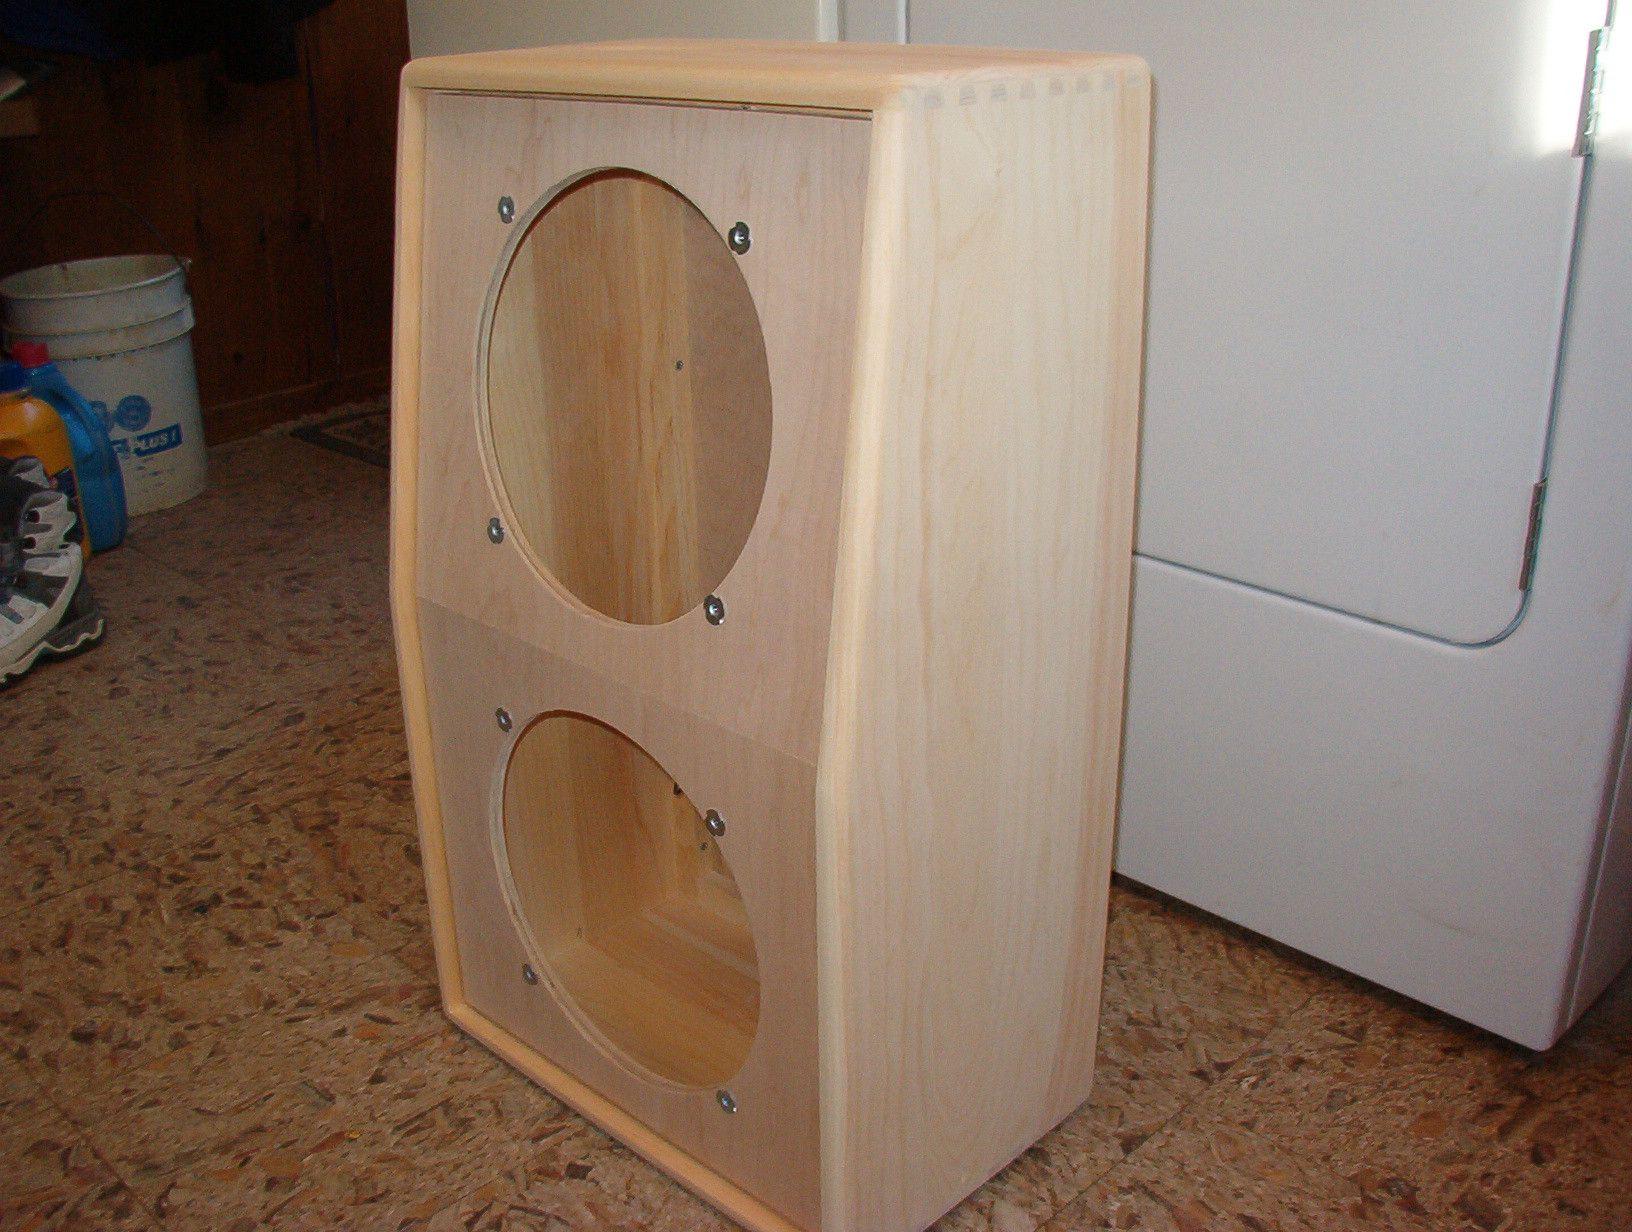 77 Custom Built Speaker Cabinets Kitchen Cabinets Storage Ideas Check More At Http Www Planetgreenspot Com 99 Custom Built Speaker Cabinets Kitchen Nook Li